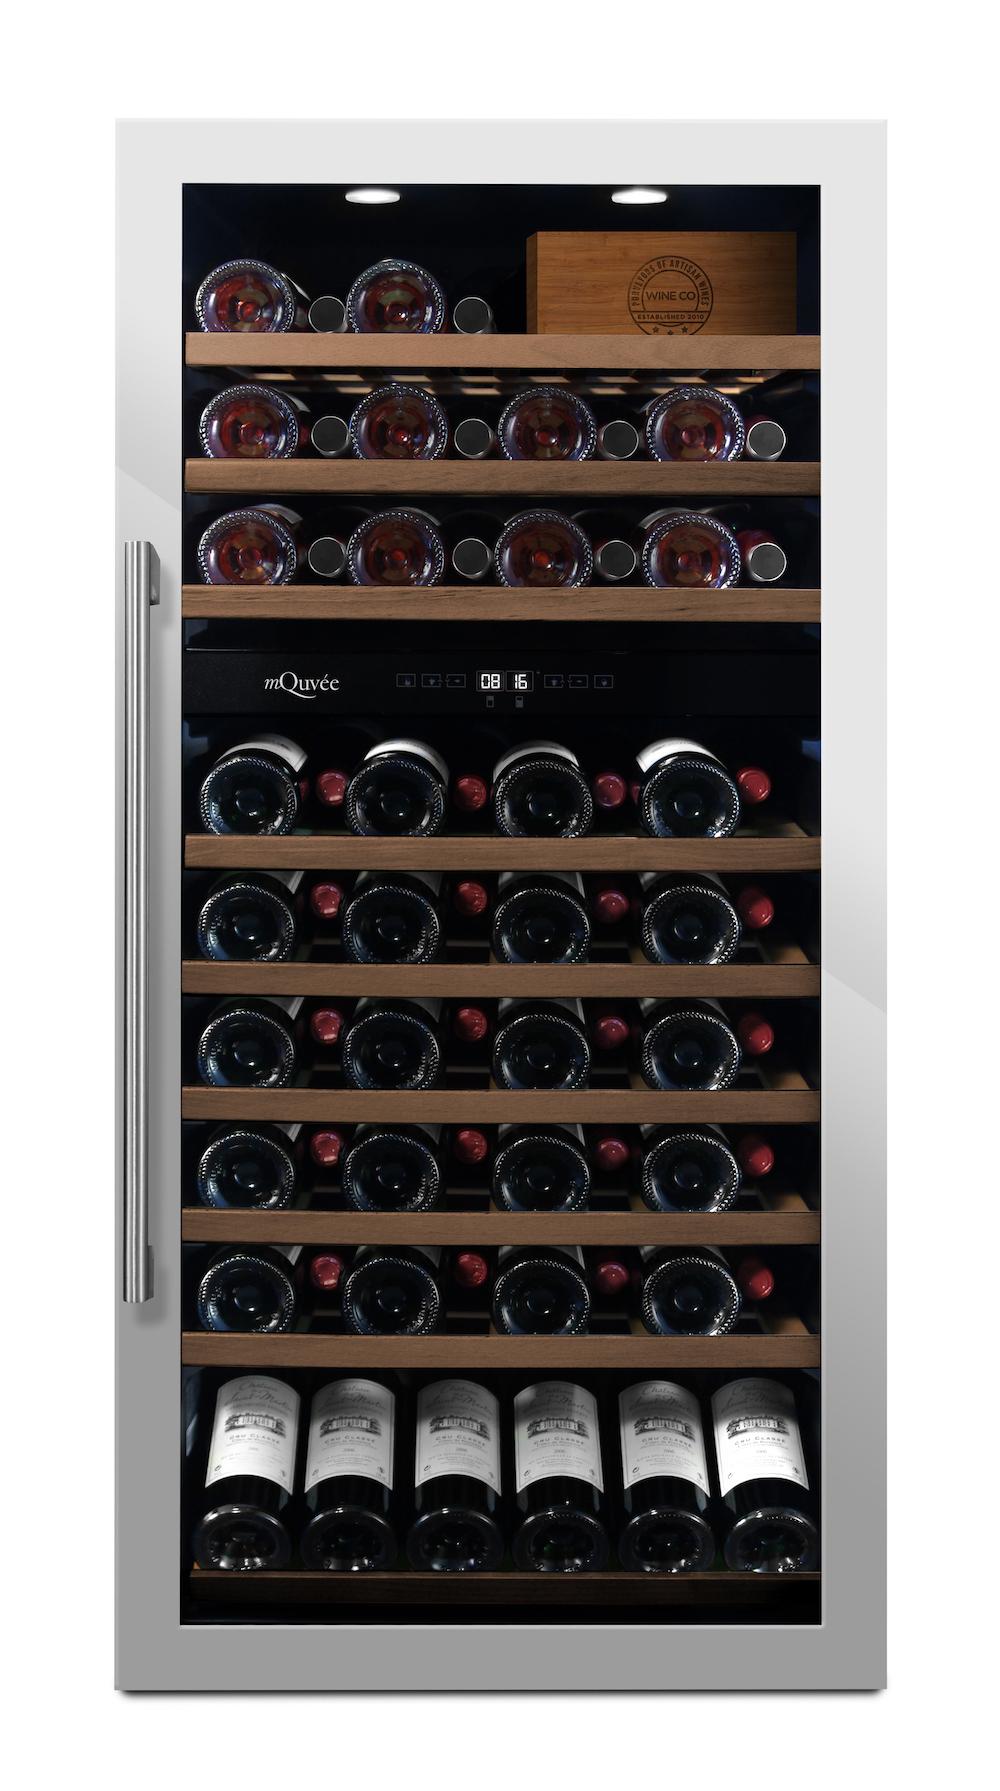 mQuvée - rostfri fristående vinkyl - rymmer 87 flaskor